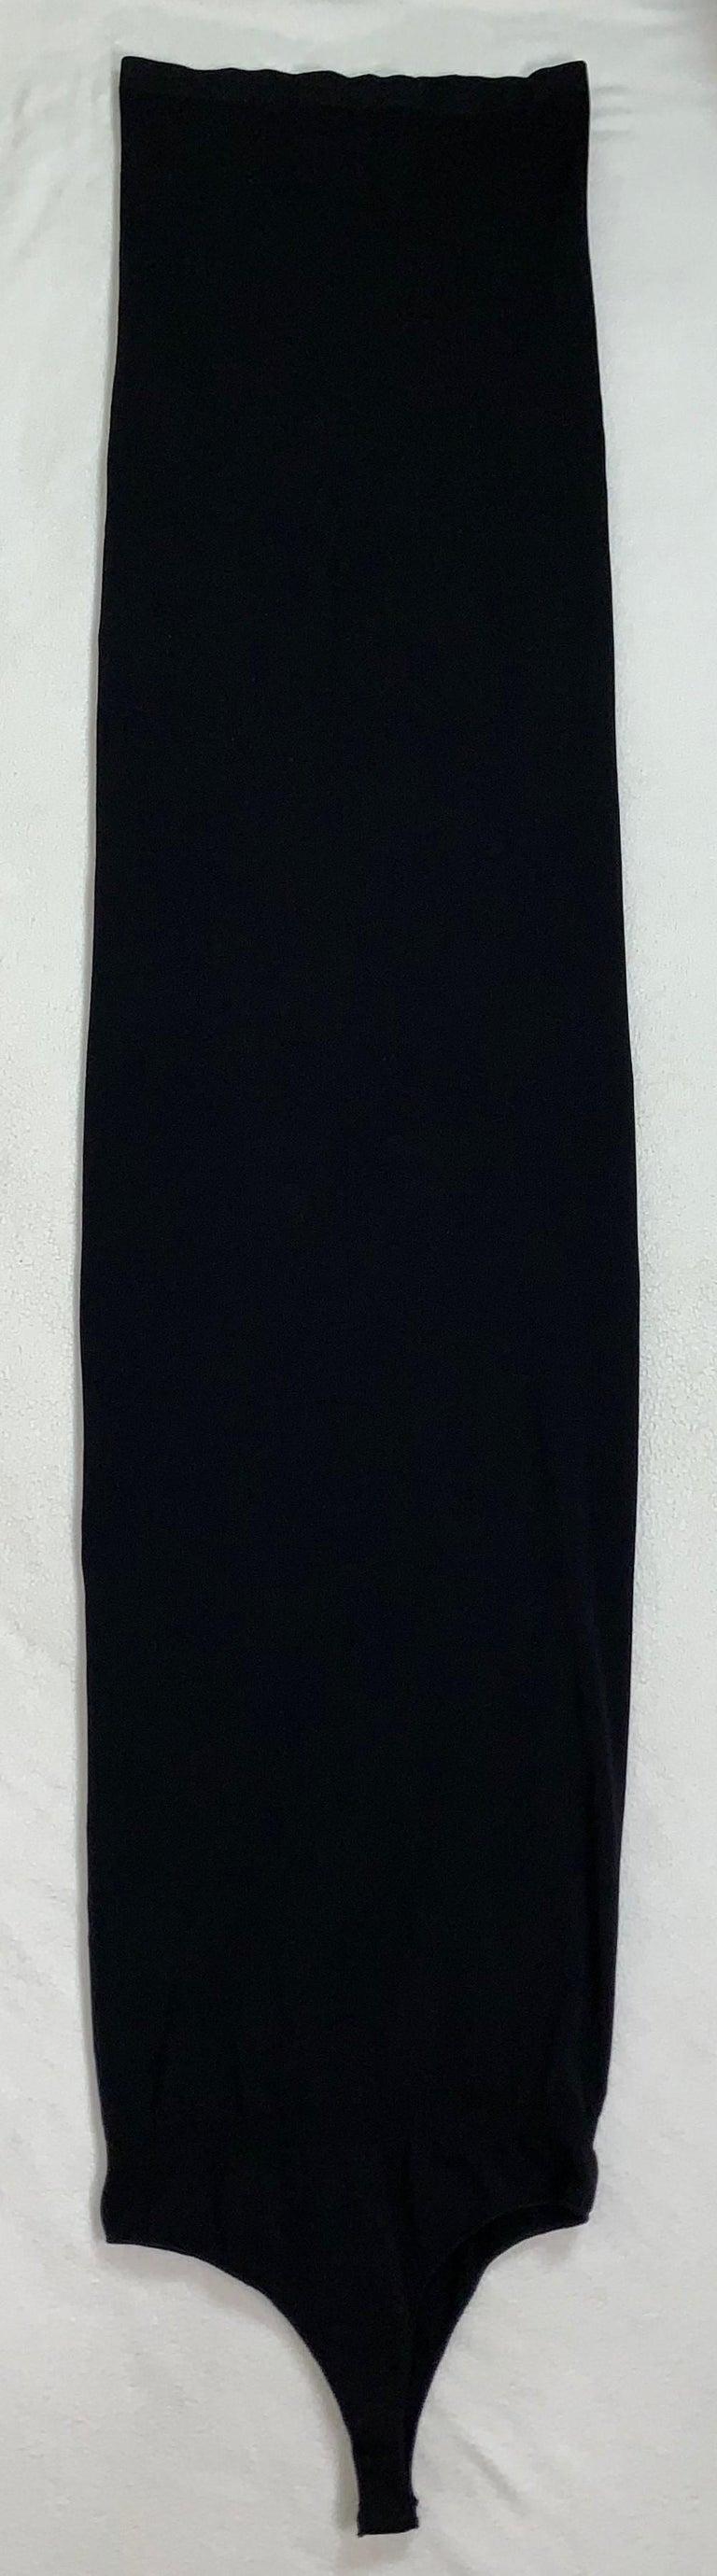 S/S 2011 Yves Saint Laurent Black Nylon Bodystocking Wiggle Dress Skirt M In Good Condition For Sale In Yukon, OK